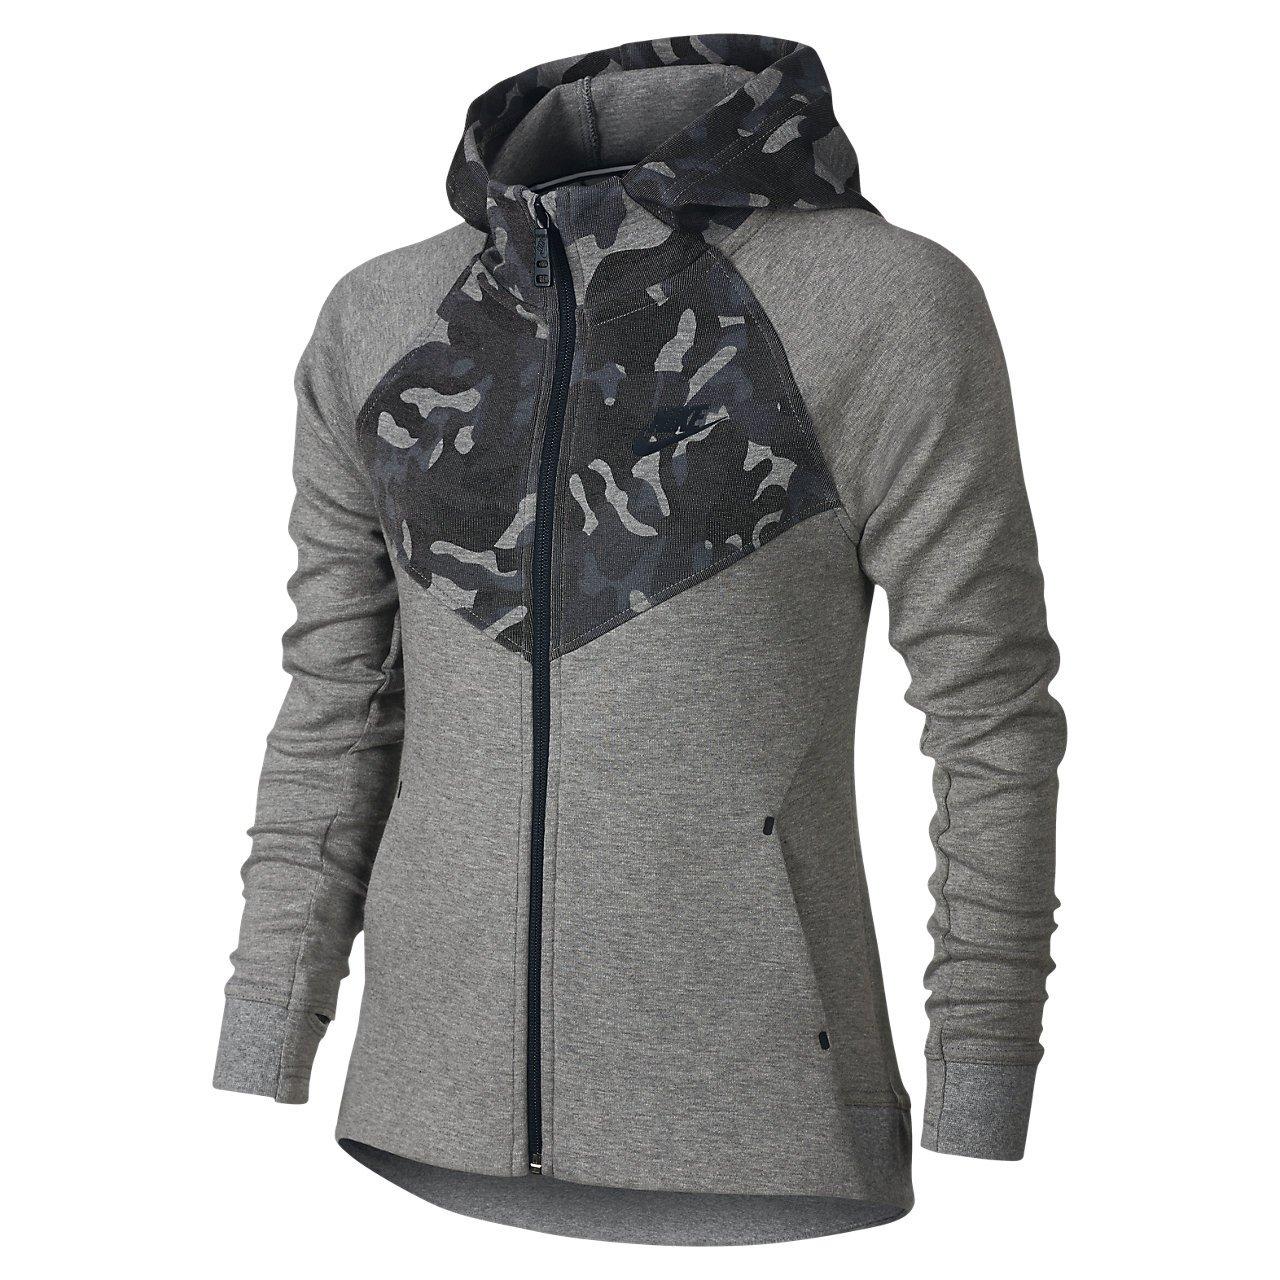 Nike Big Girls' (7-16) Tech Fleece Windrunner Full Zip Hoodie (X-Small, Carbon Heather/Black) by NIKE